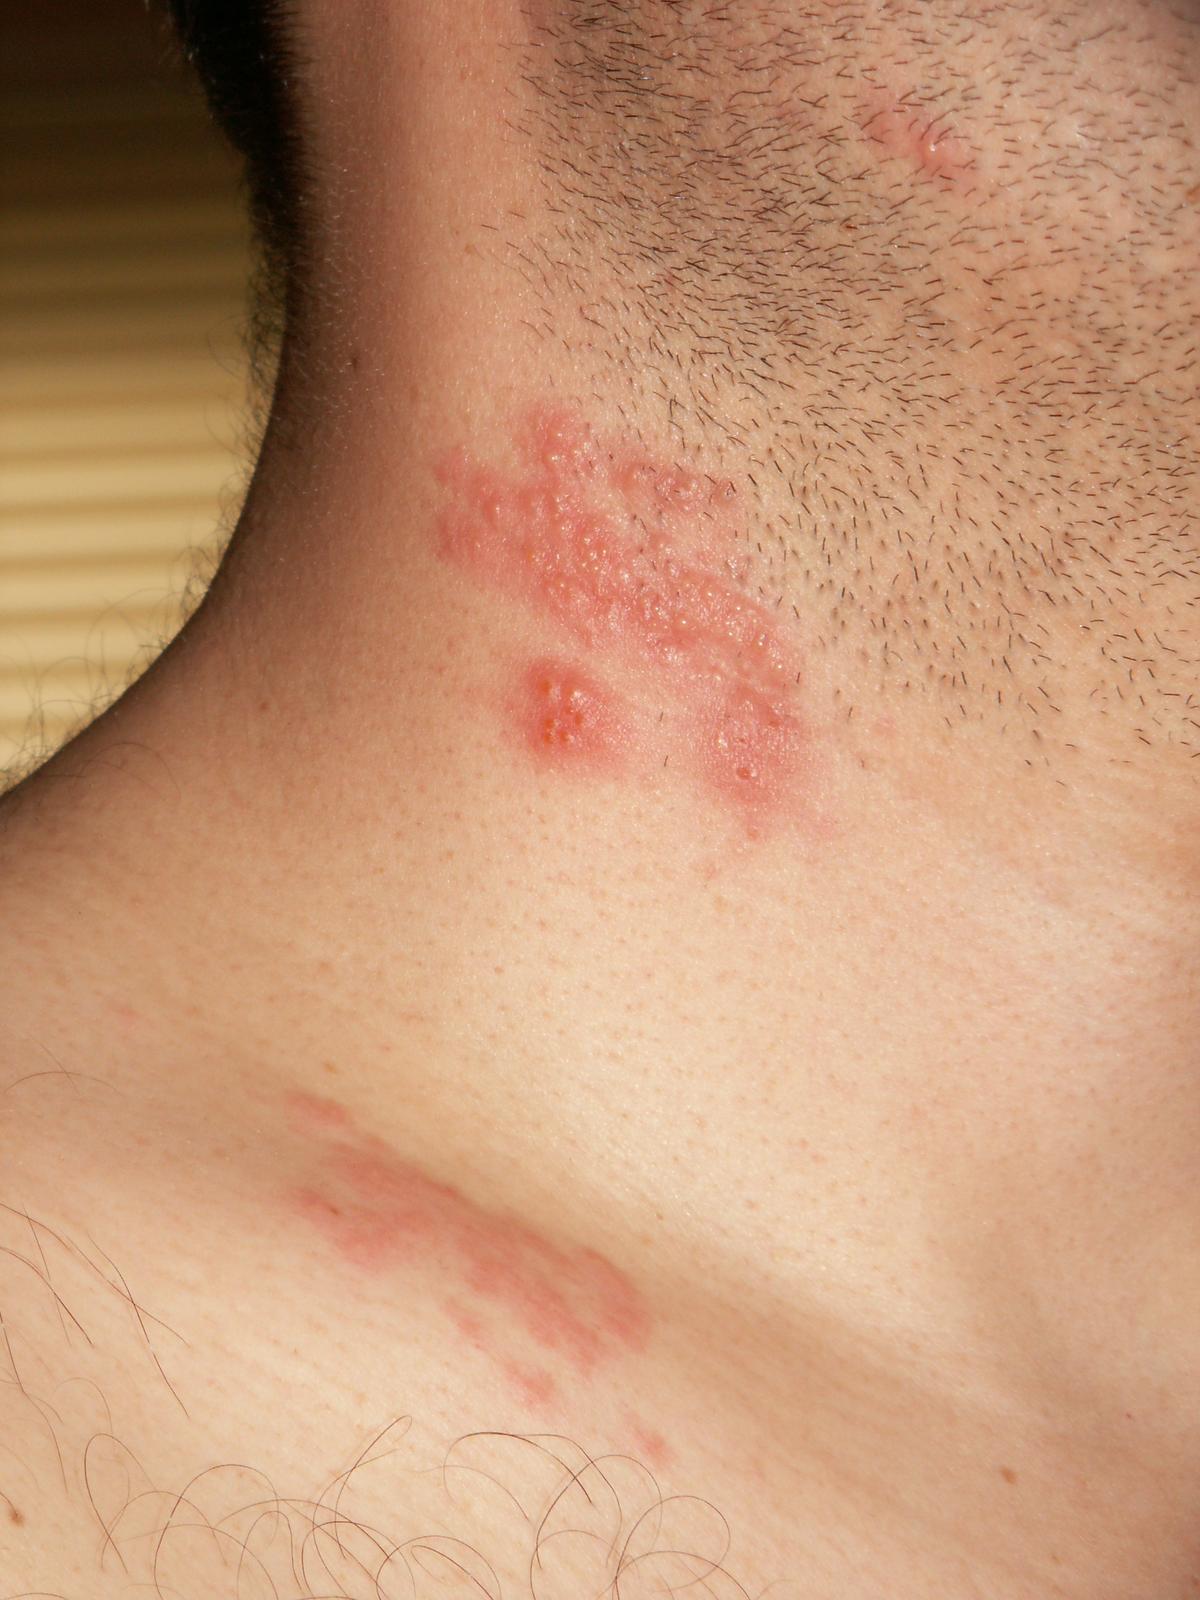 papilloma virus donne verruche sintomas del papiloma genital en el hombre